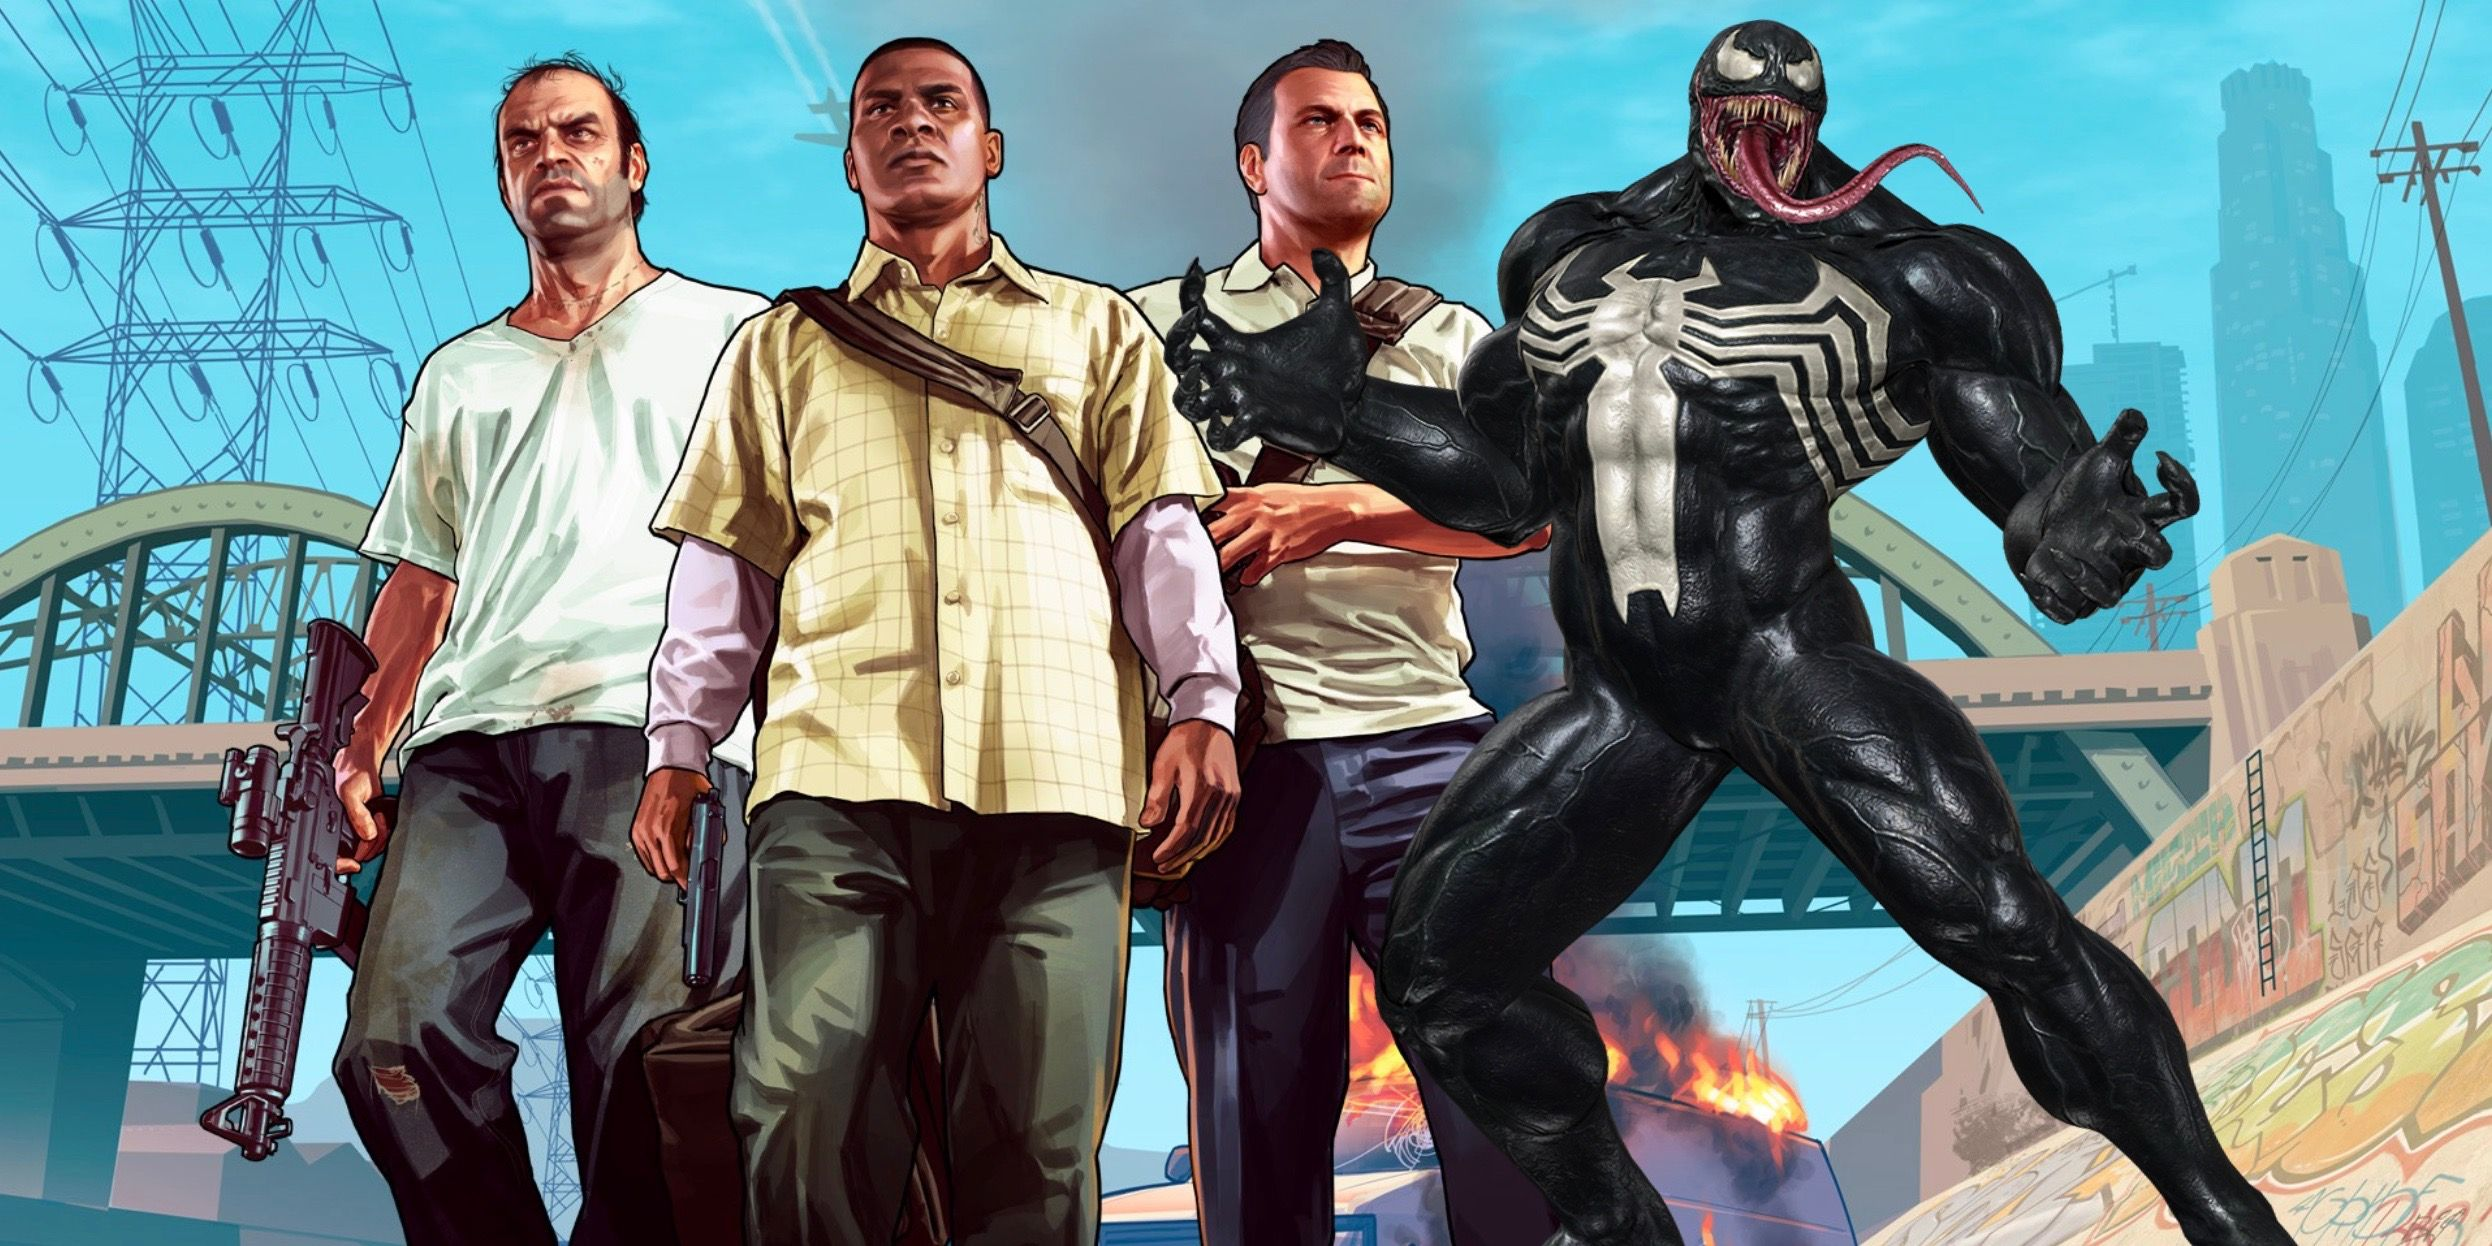 Venom Attacks Los Santos in Crazy Grand Theft Auto V Mod